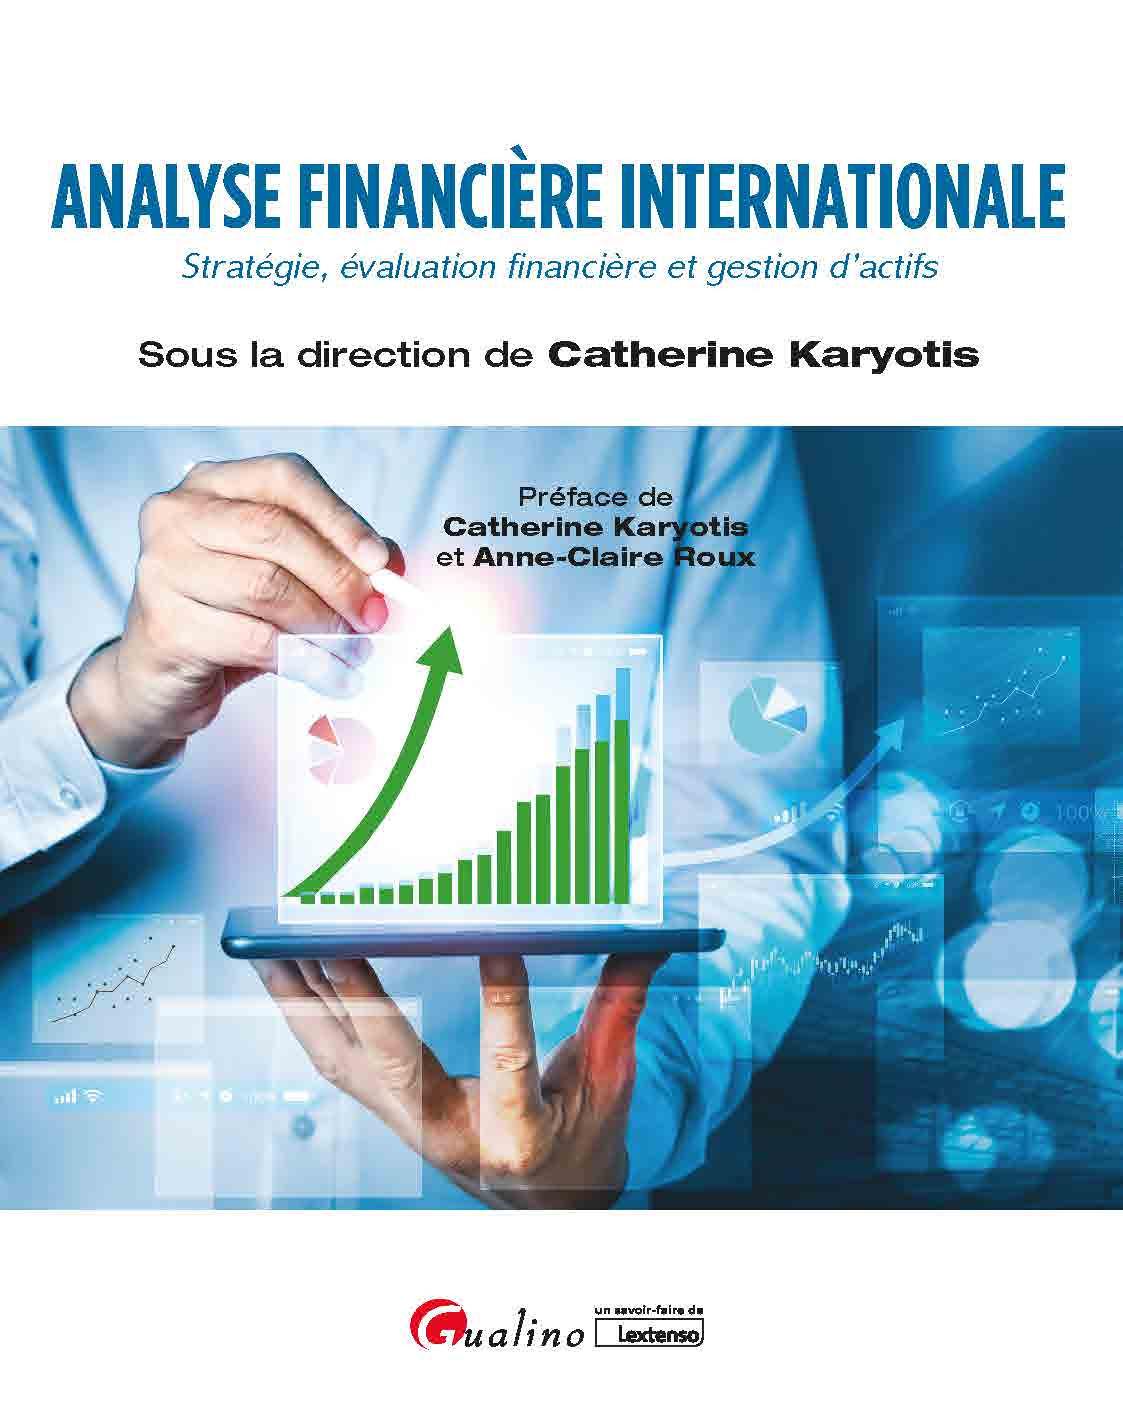 Analyse financière internationale